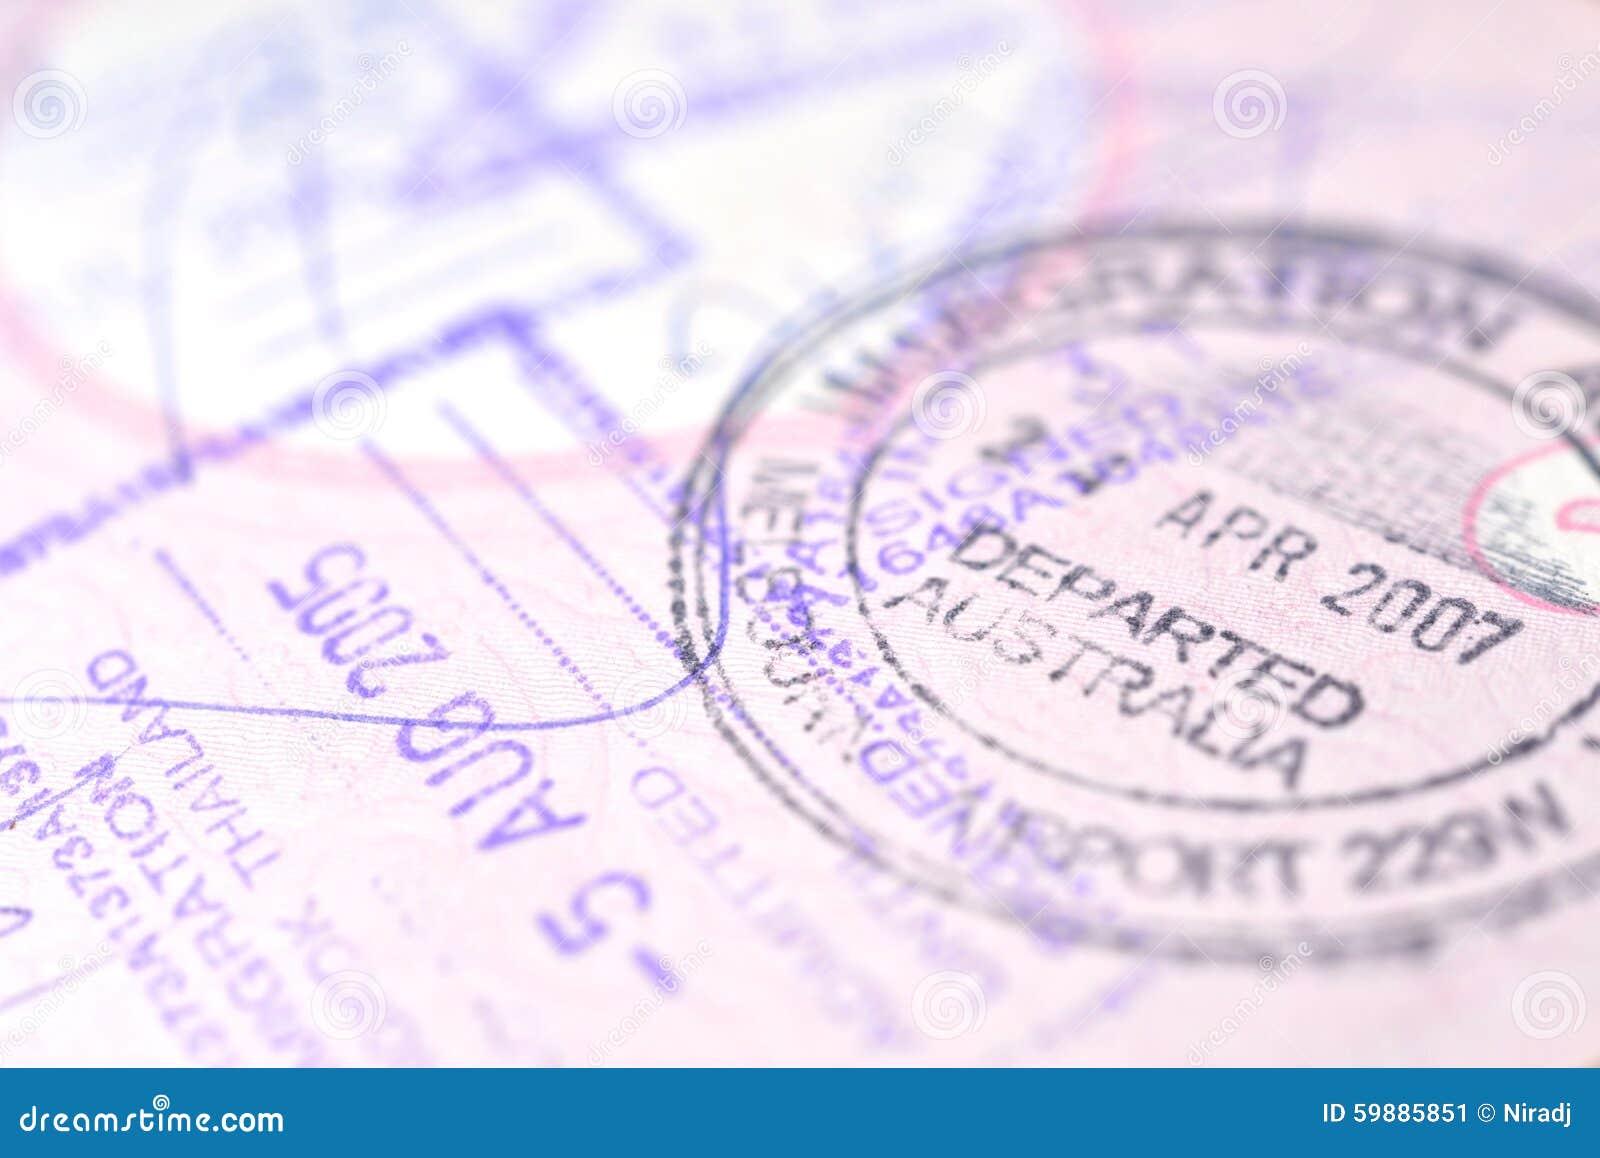 Passport expiration date in Melbourne